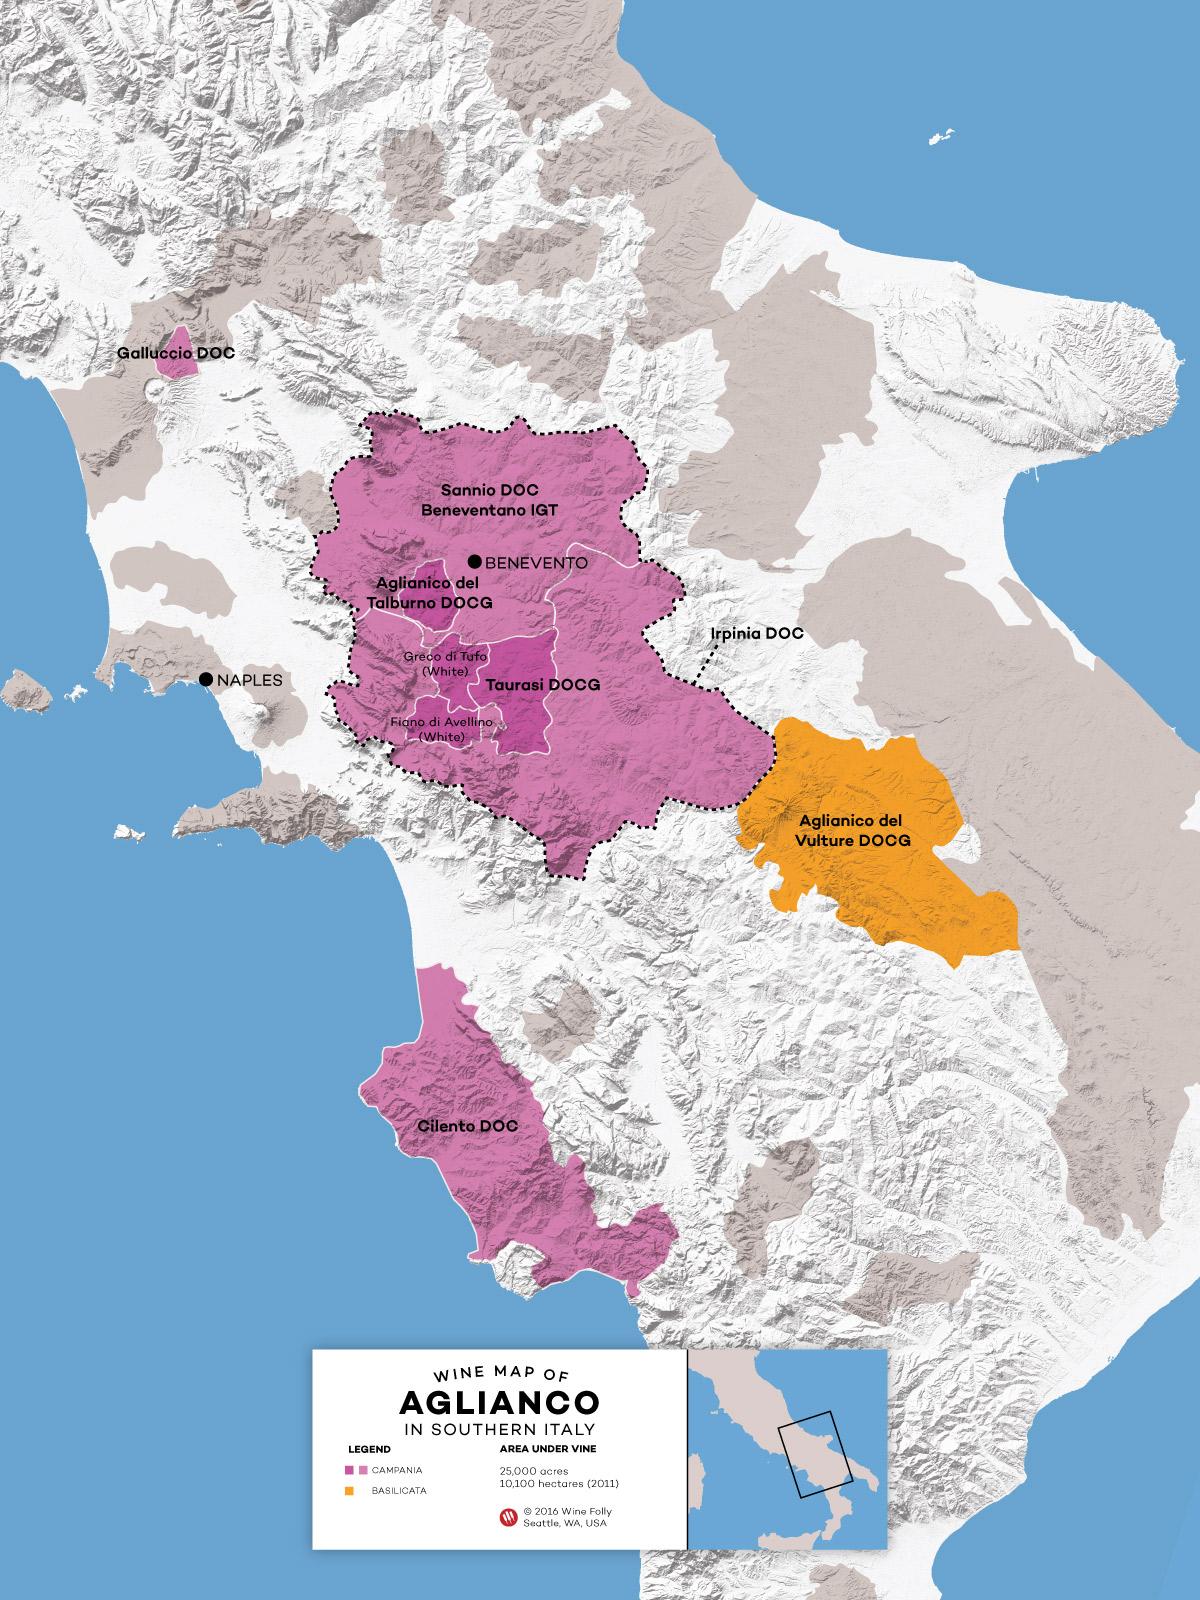 Southern Italy Aglianico regions within Basilicata and Campania by Wine Folly